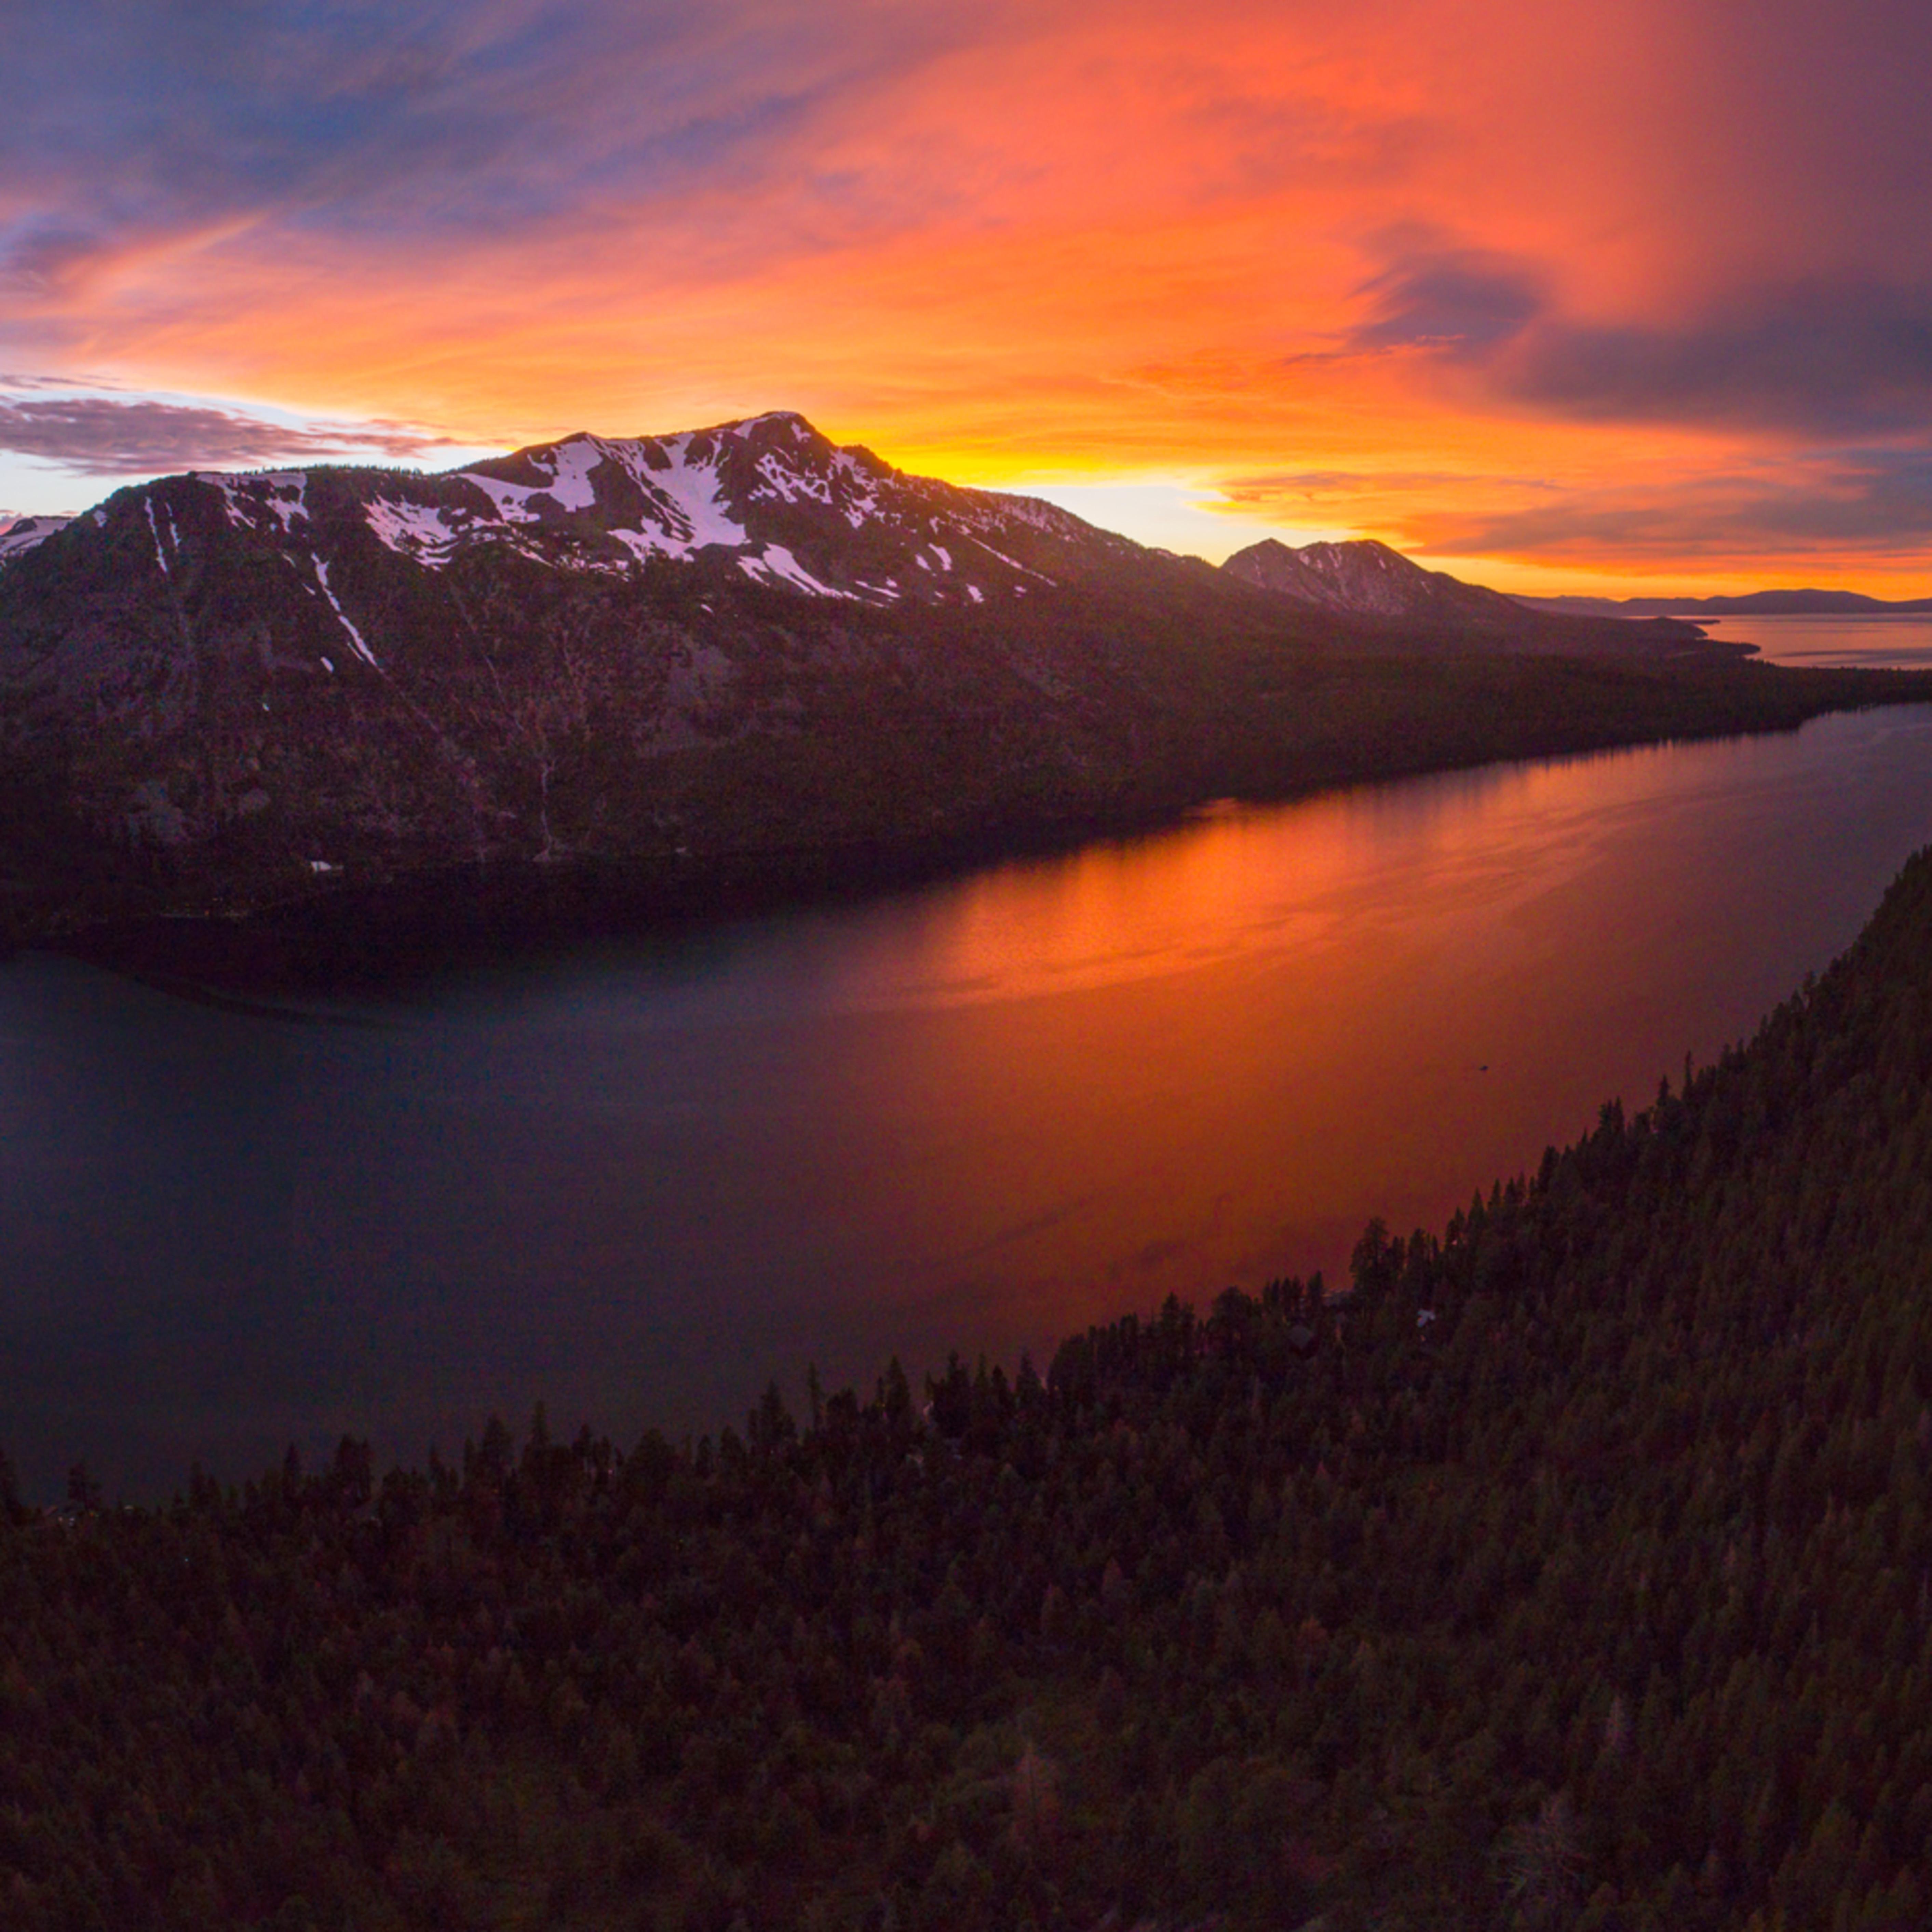 Fallen leaf lake sunset aerial 2 6 18 nlhvuj